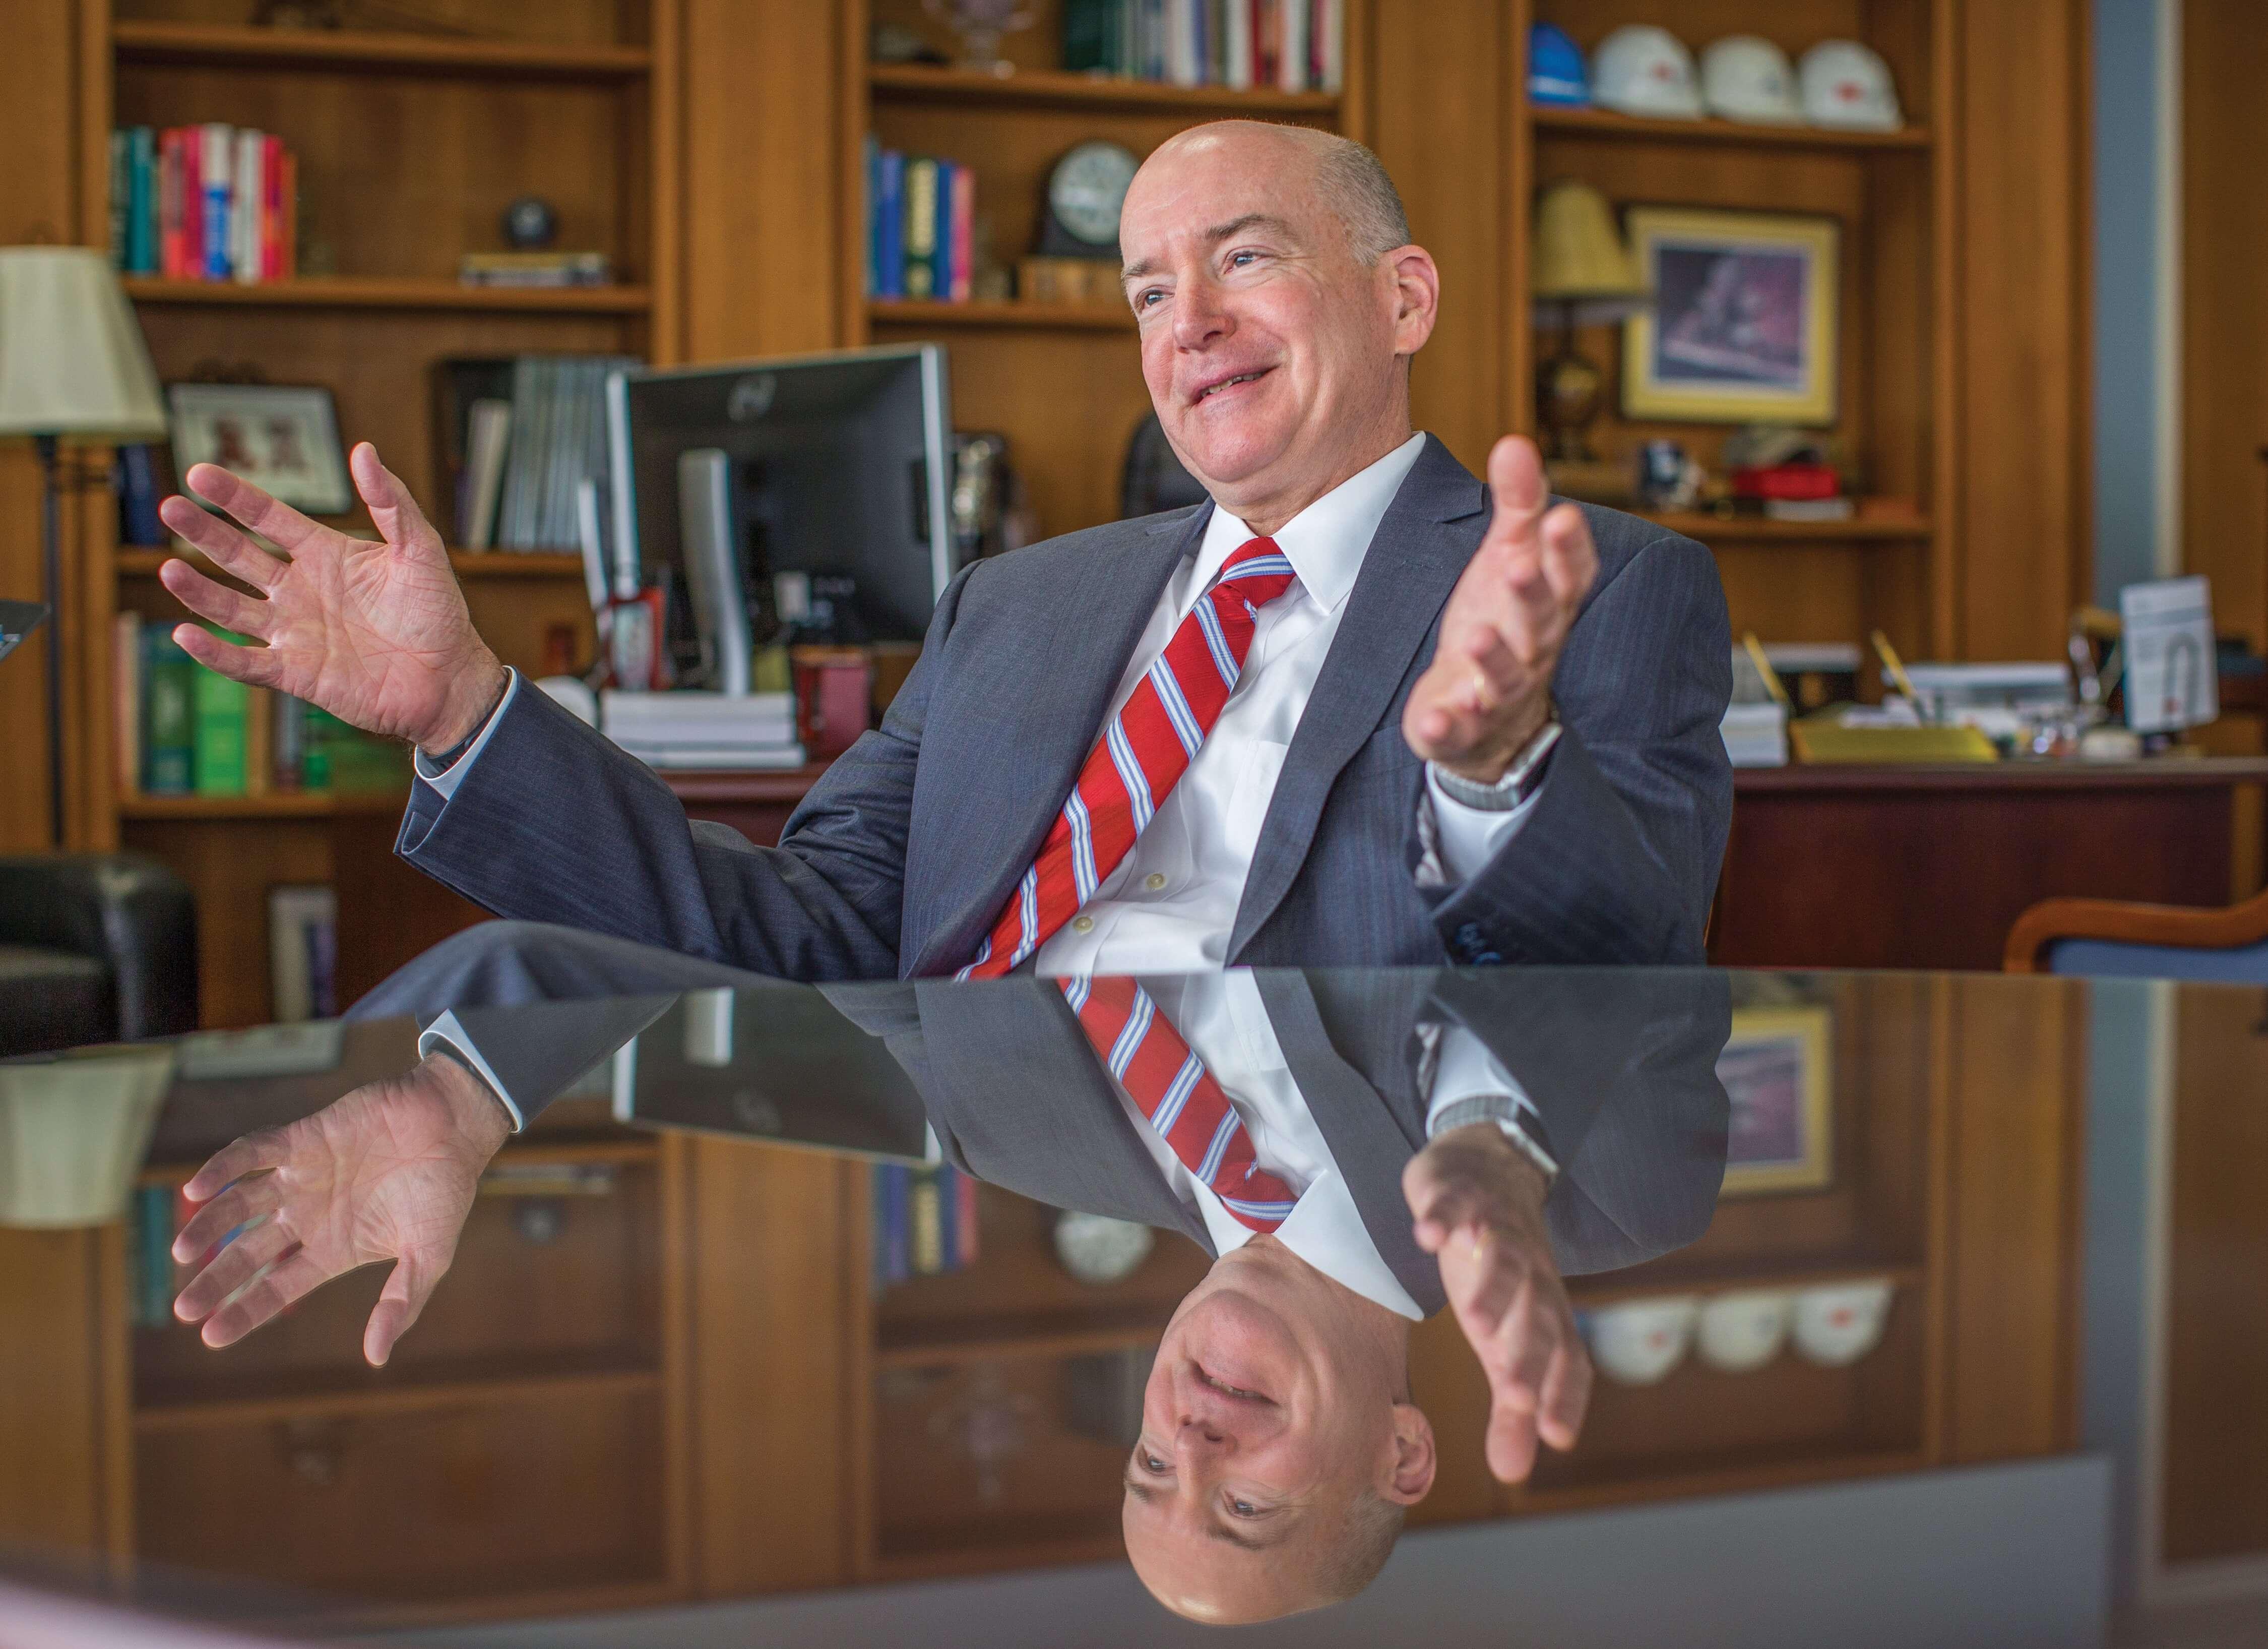 David L. Callender, M.D., President of the University of Texas Medical Branch at Galveston (Credit: Nick de la Torre)